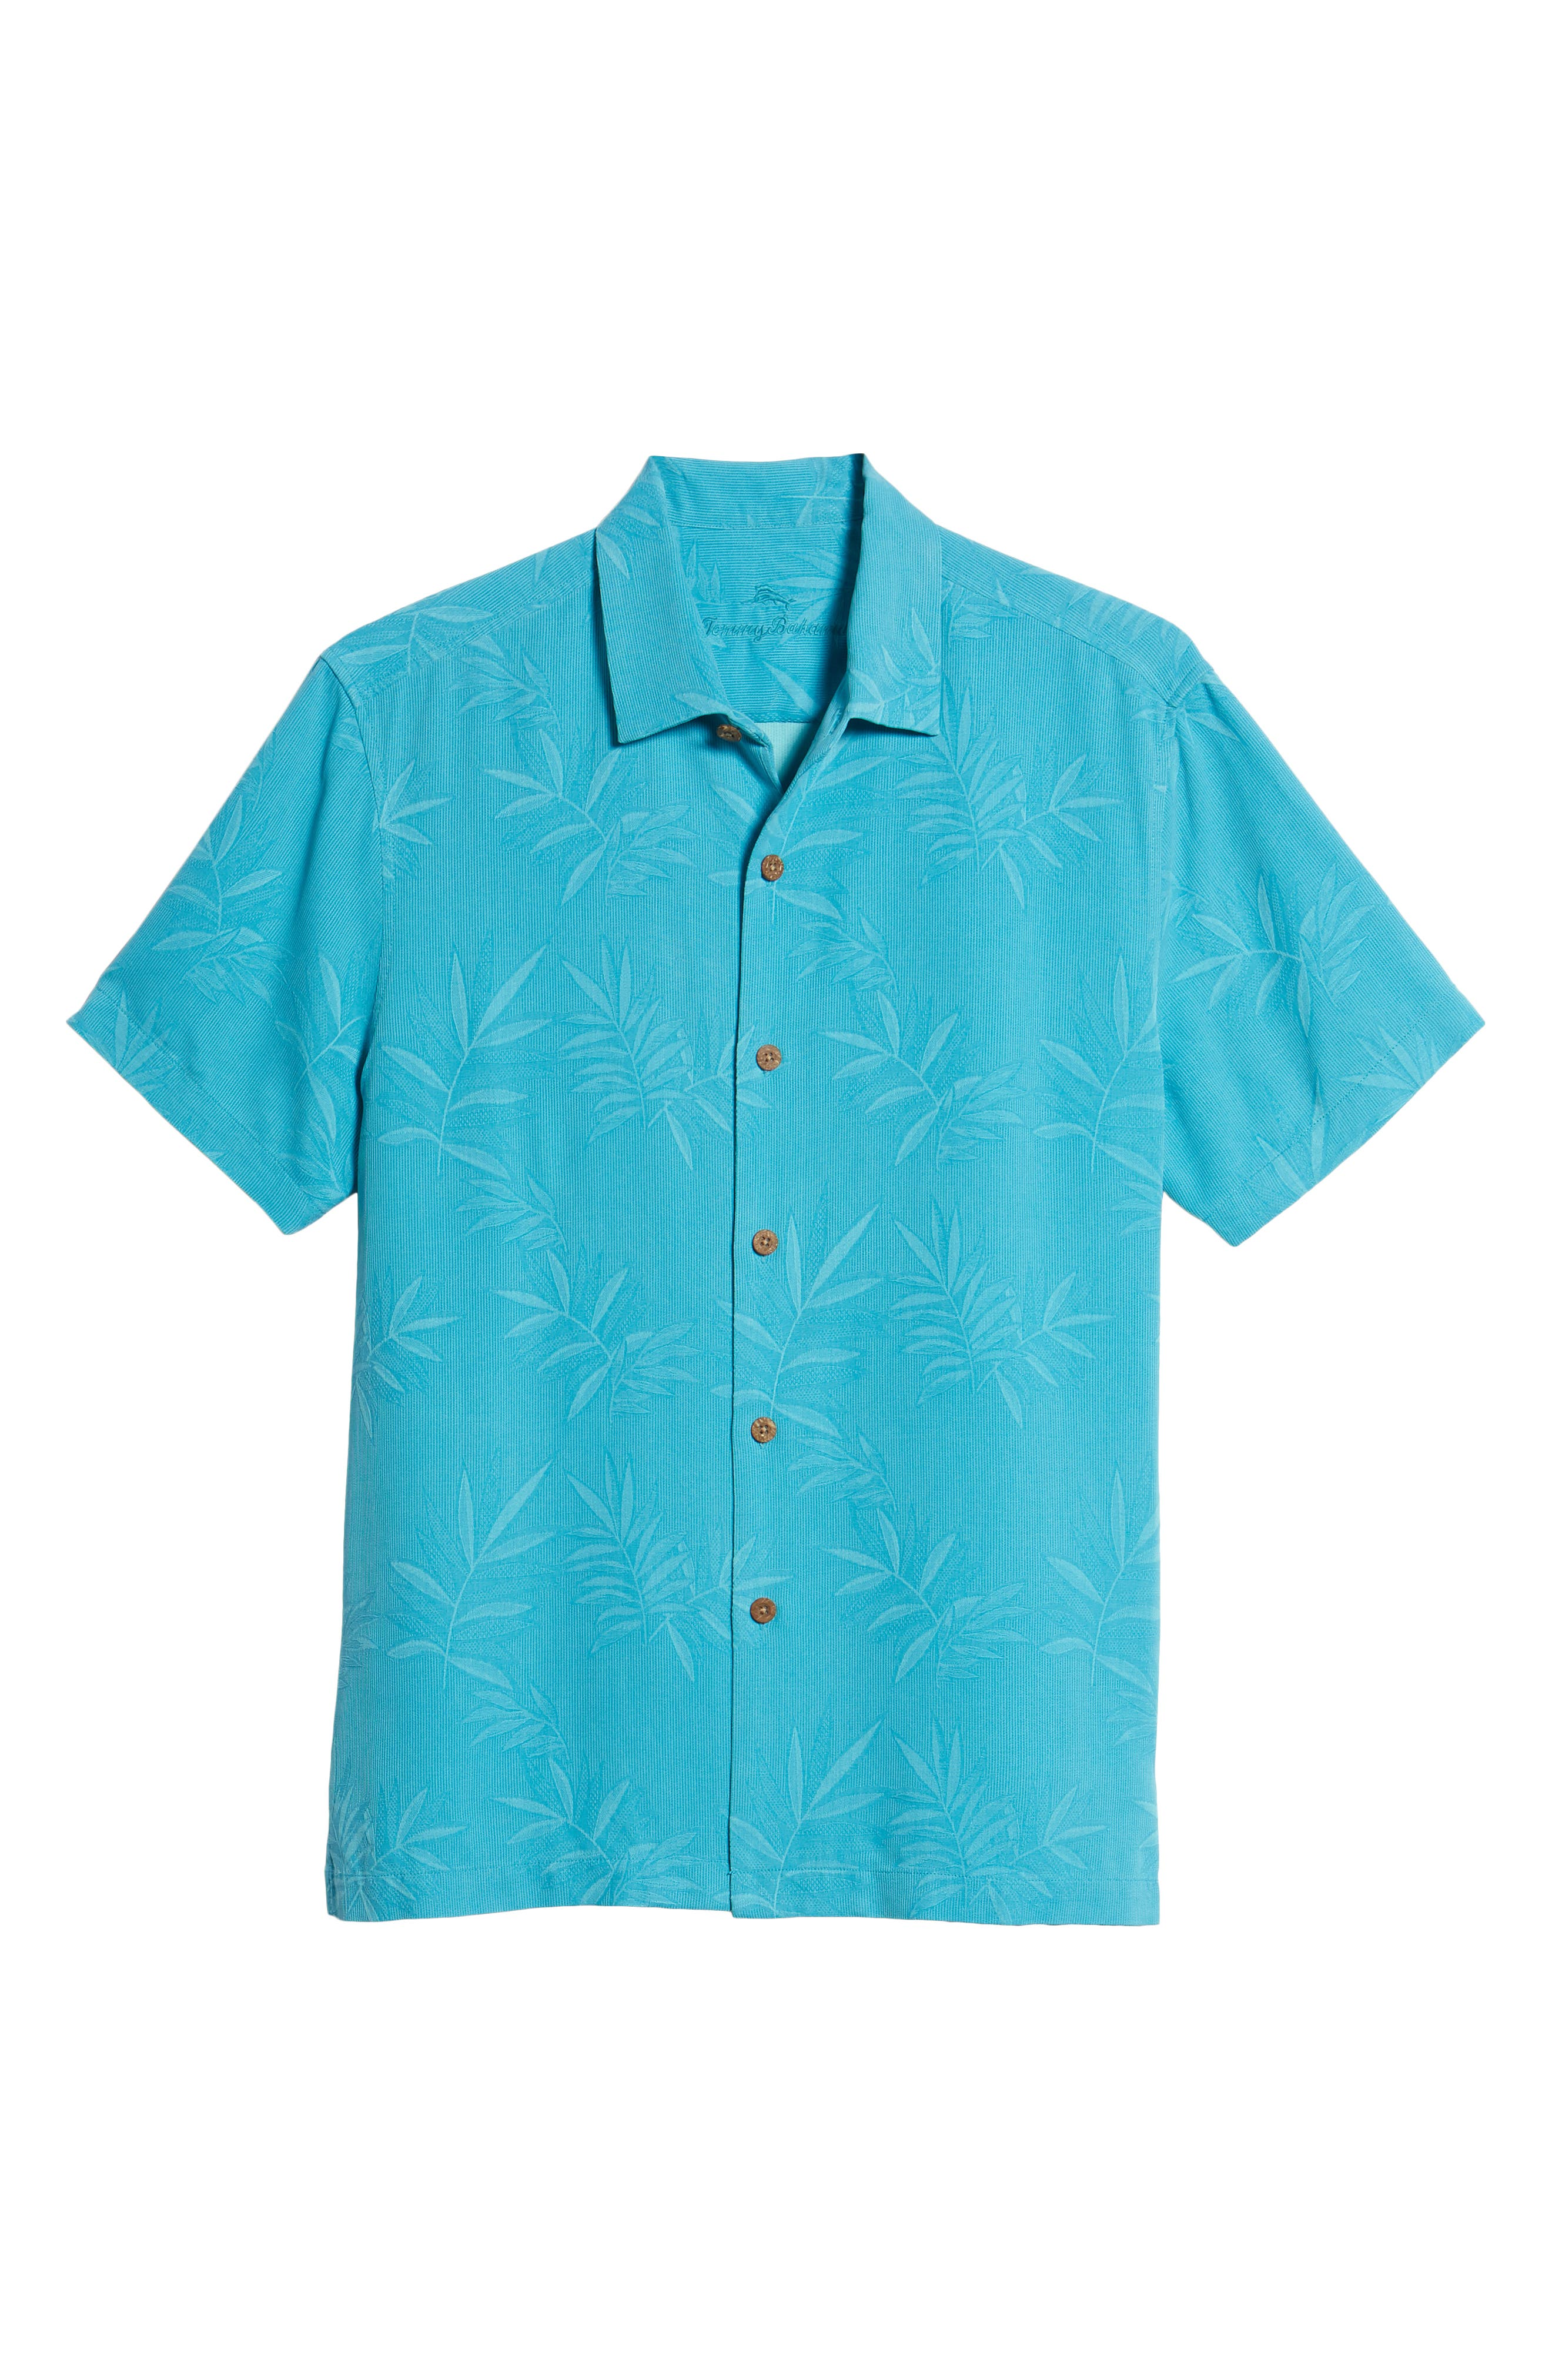 Luau Floral Silk Shirt,                             Alternate thumbnail 6, color,                             Pool Party Blue